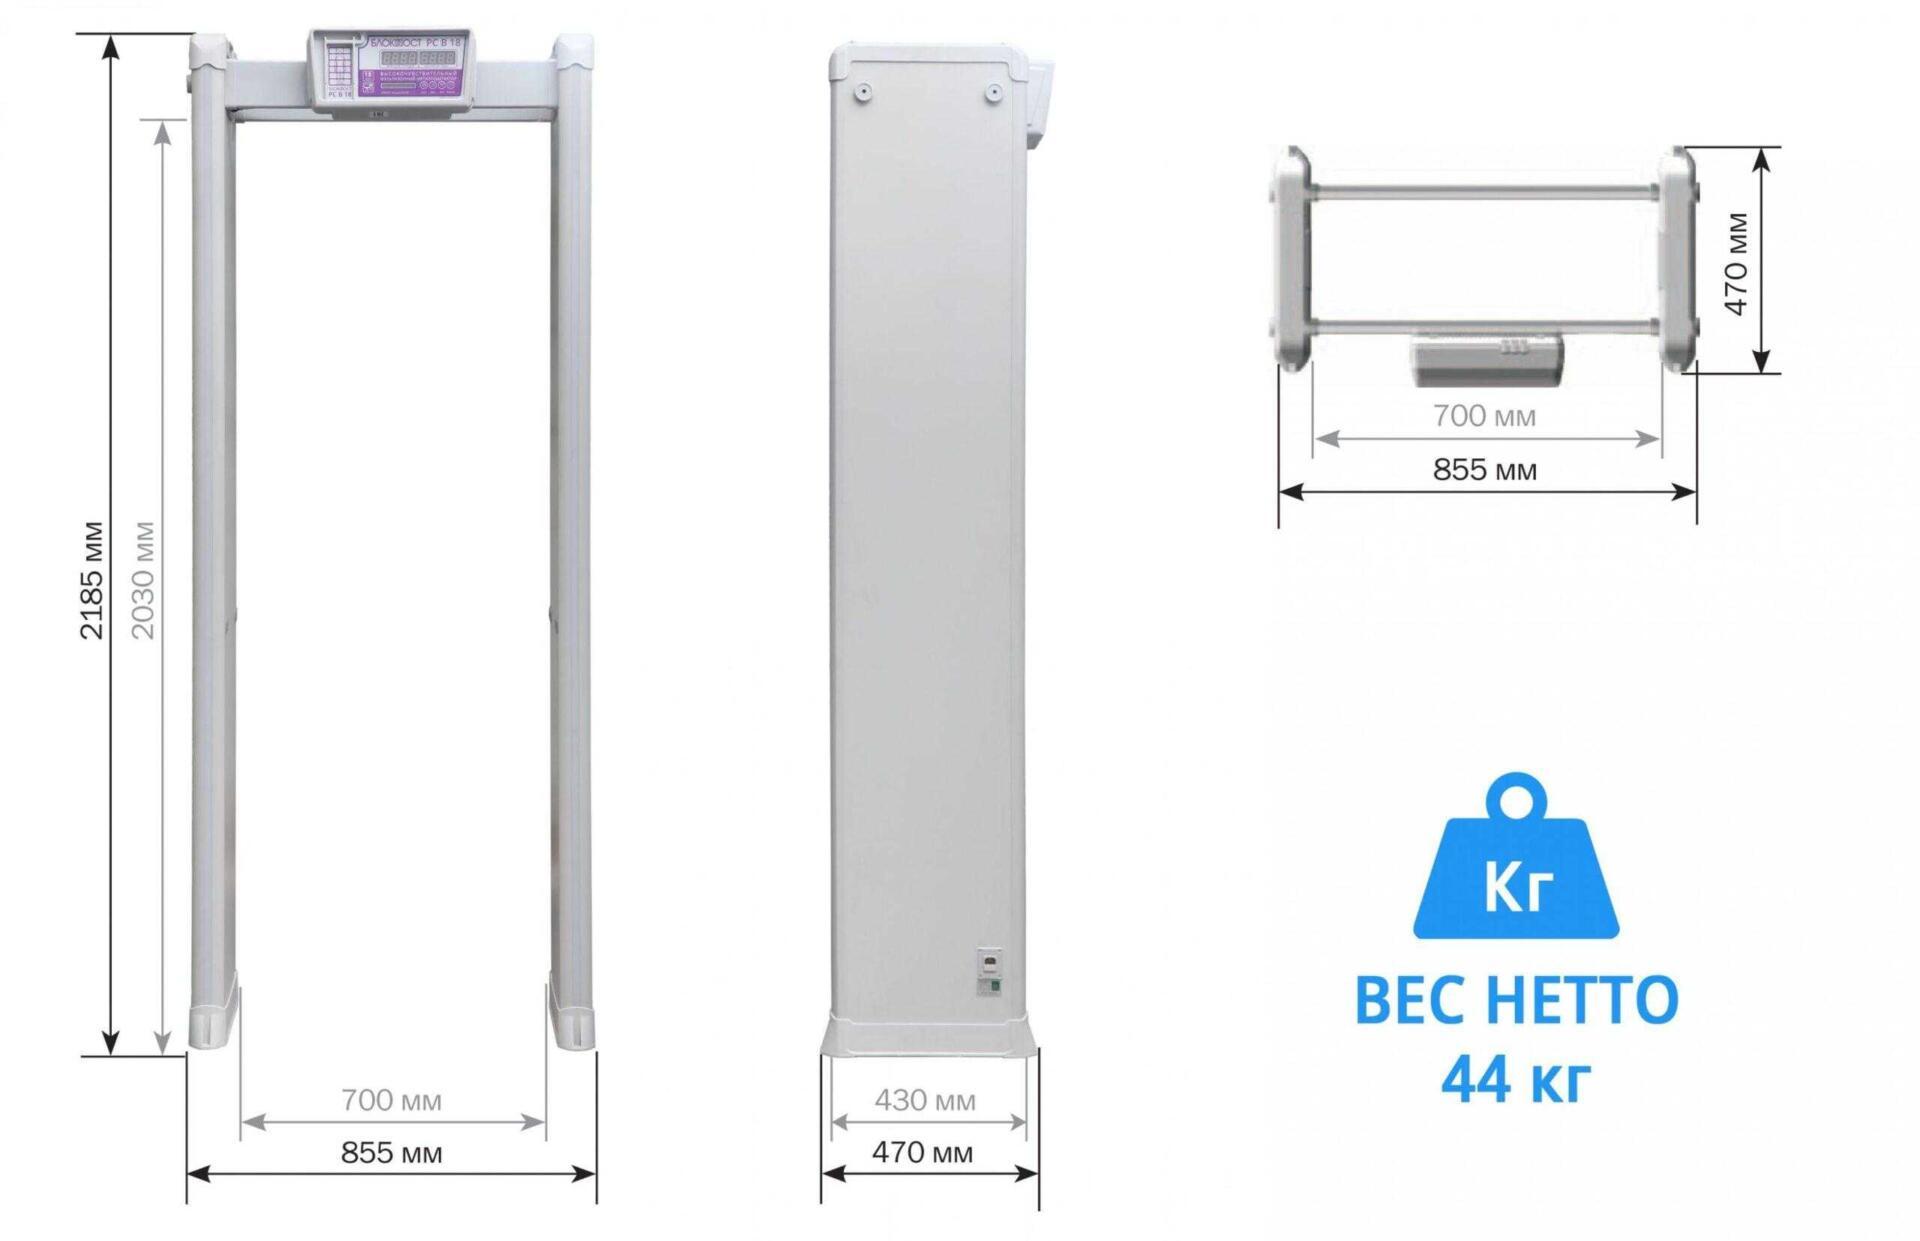 Blokpost-PCB18-shema-2000-end.jpg акрон-сб